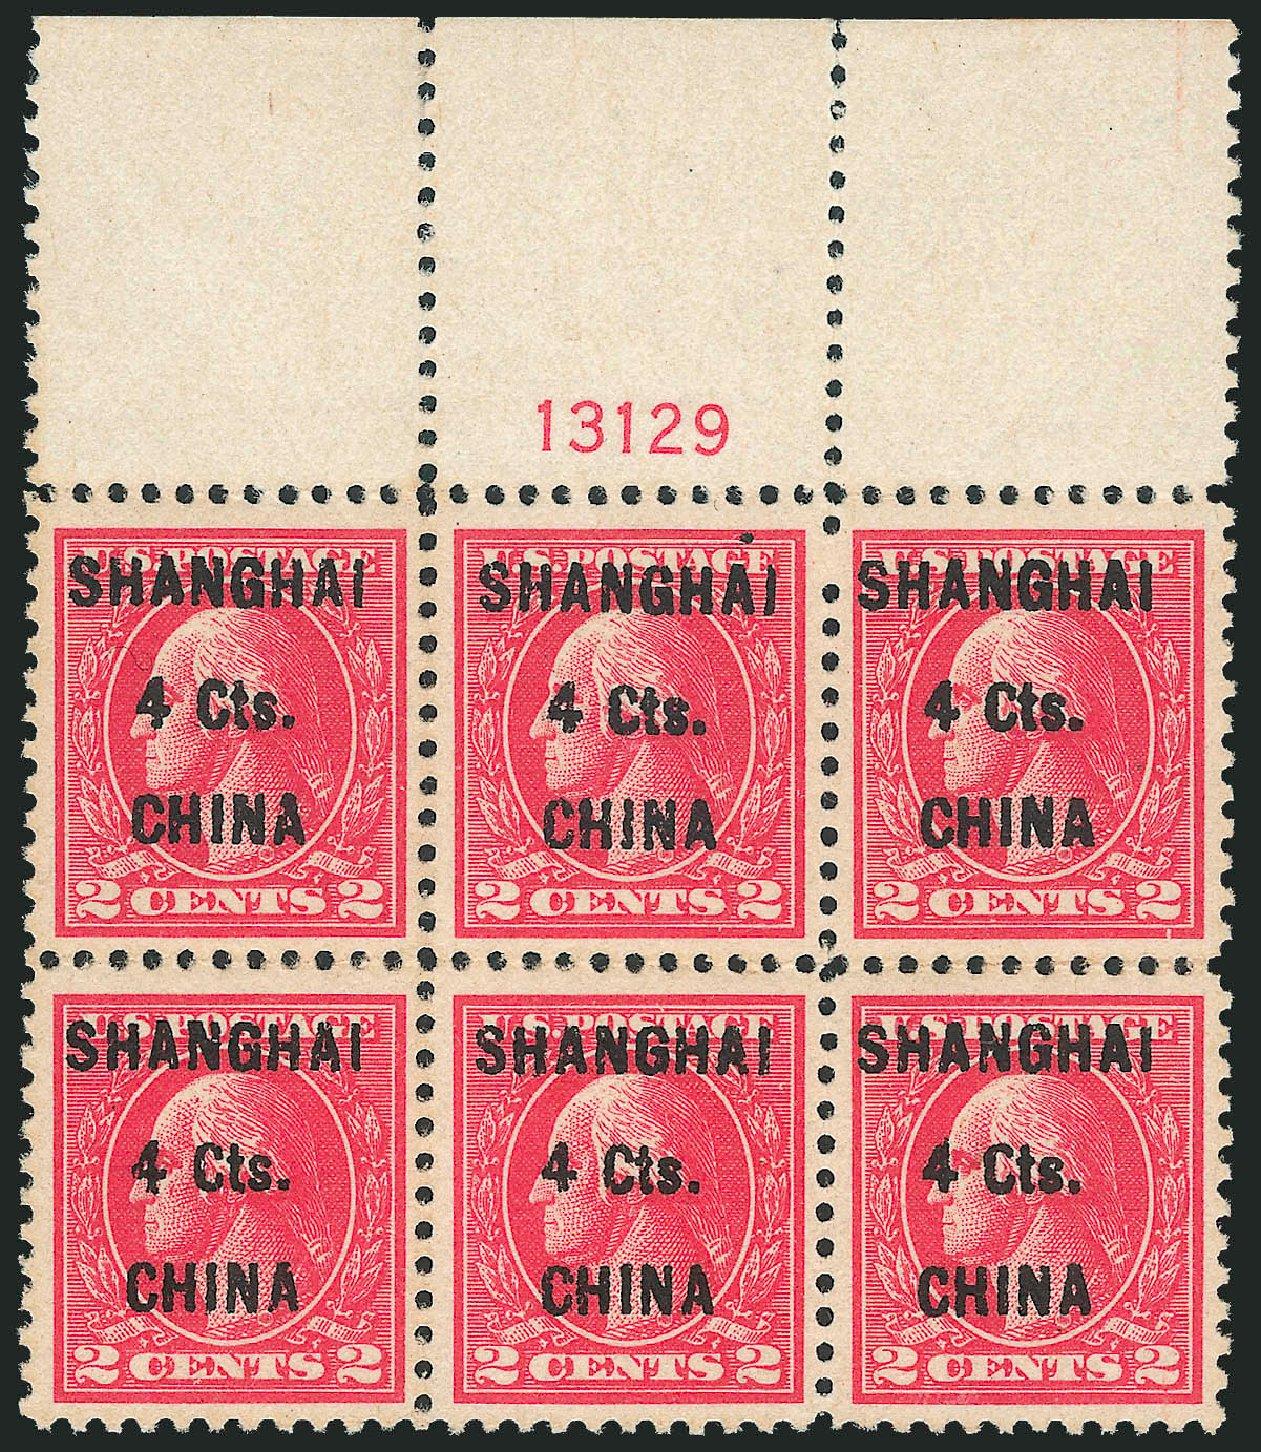 US Stamps Prices Scott Catalog K18 - 4c 1922 China Shanghai on 2c. Robert Siegel Auction Galleries, Mar 2013, Sale 1040, Lot 2150